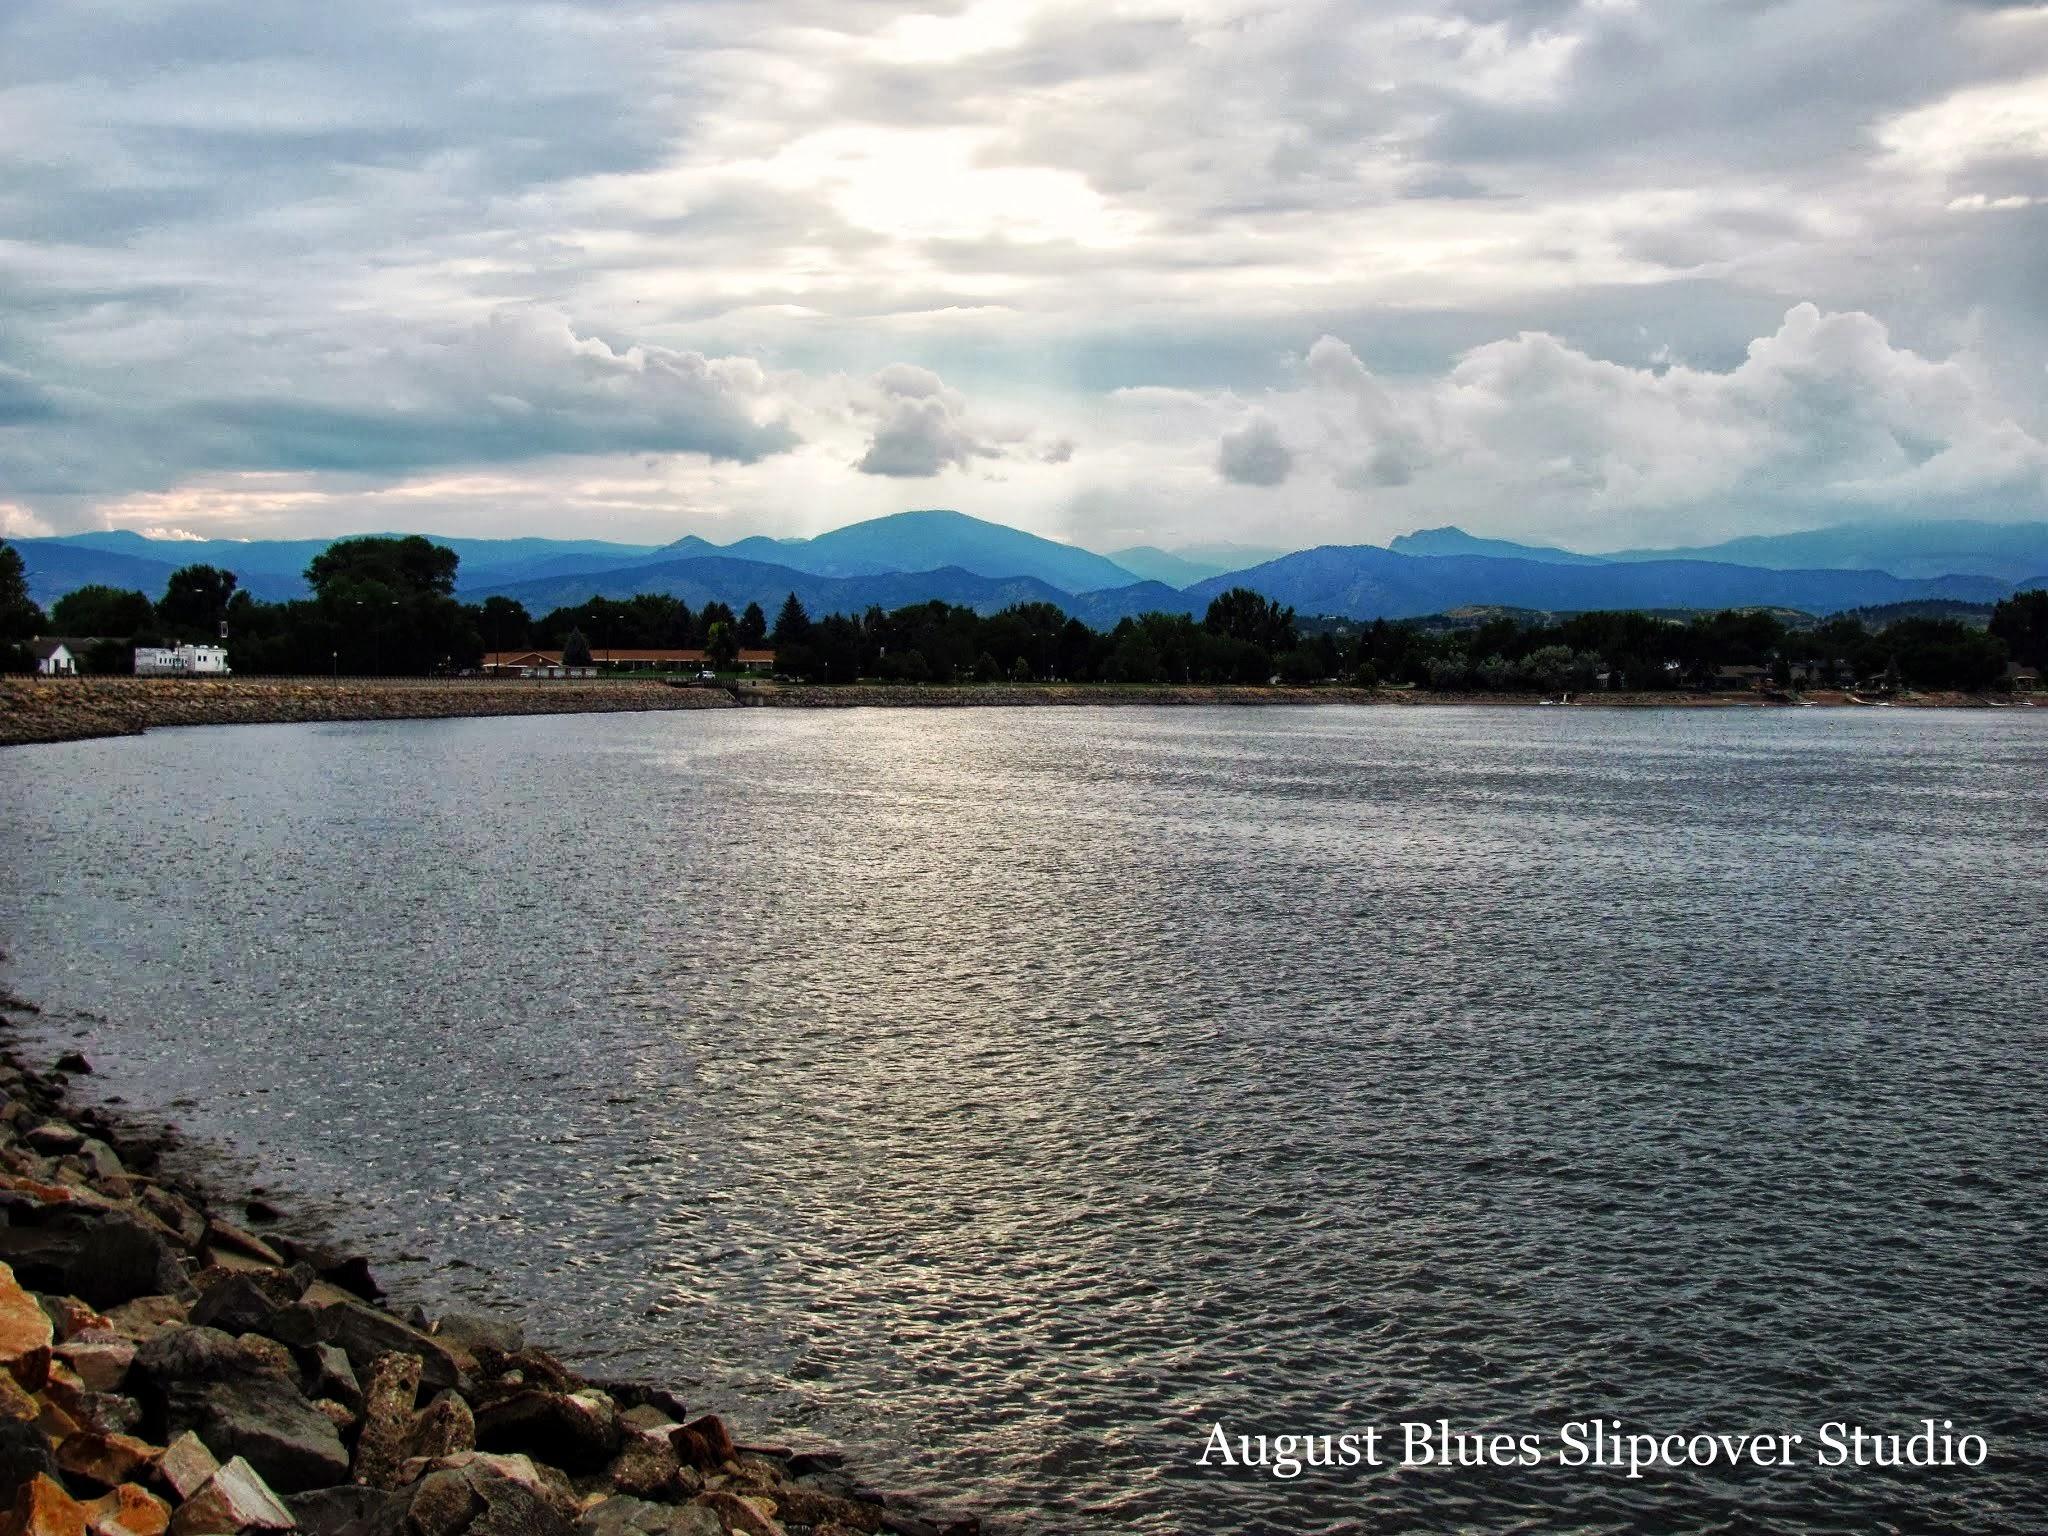 August Blues - Colorado Lake